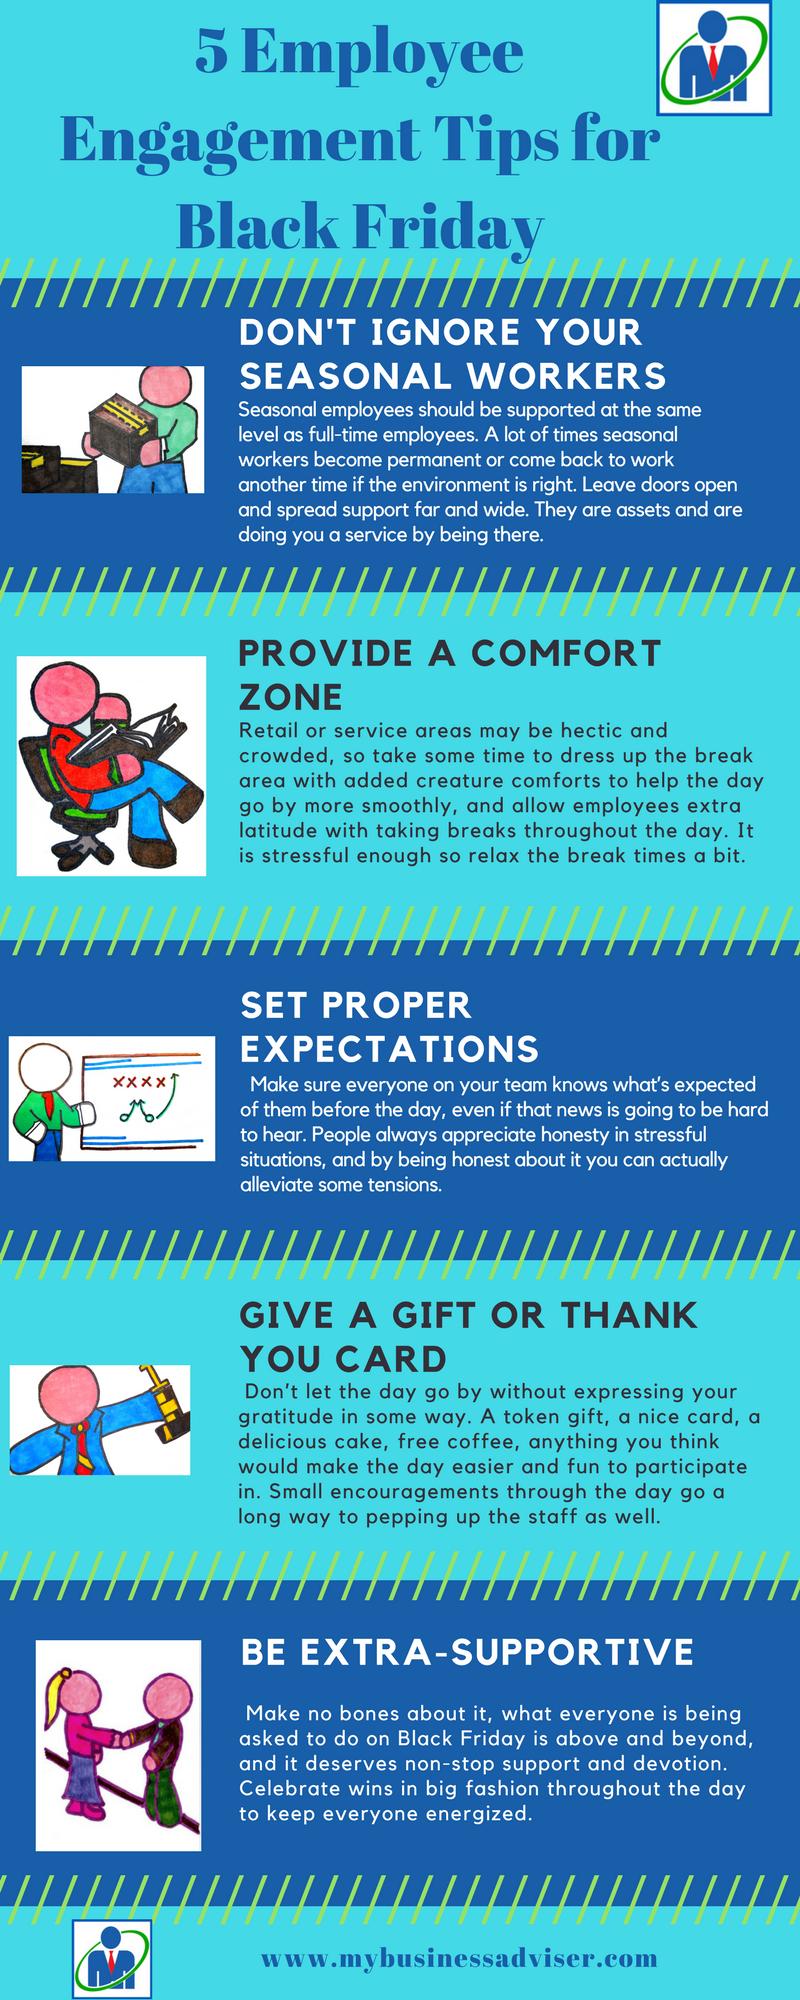 5 Engagement Tips for Black Friday